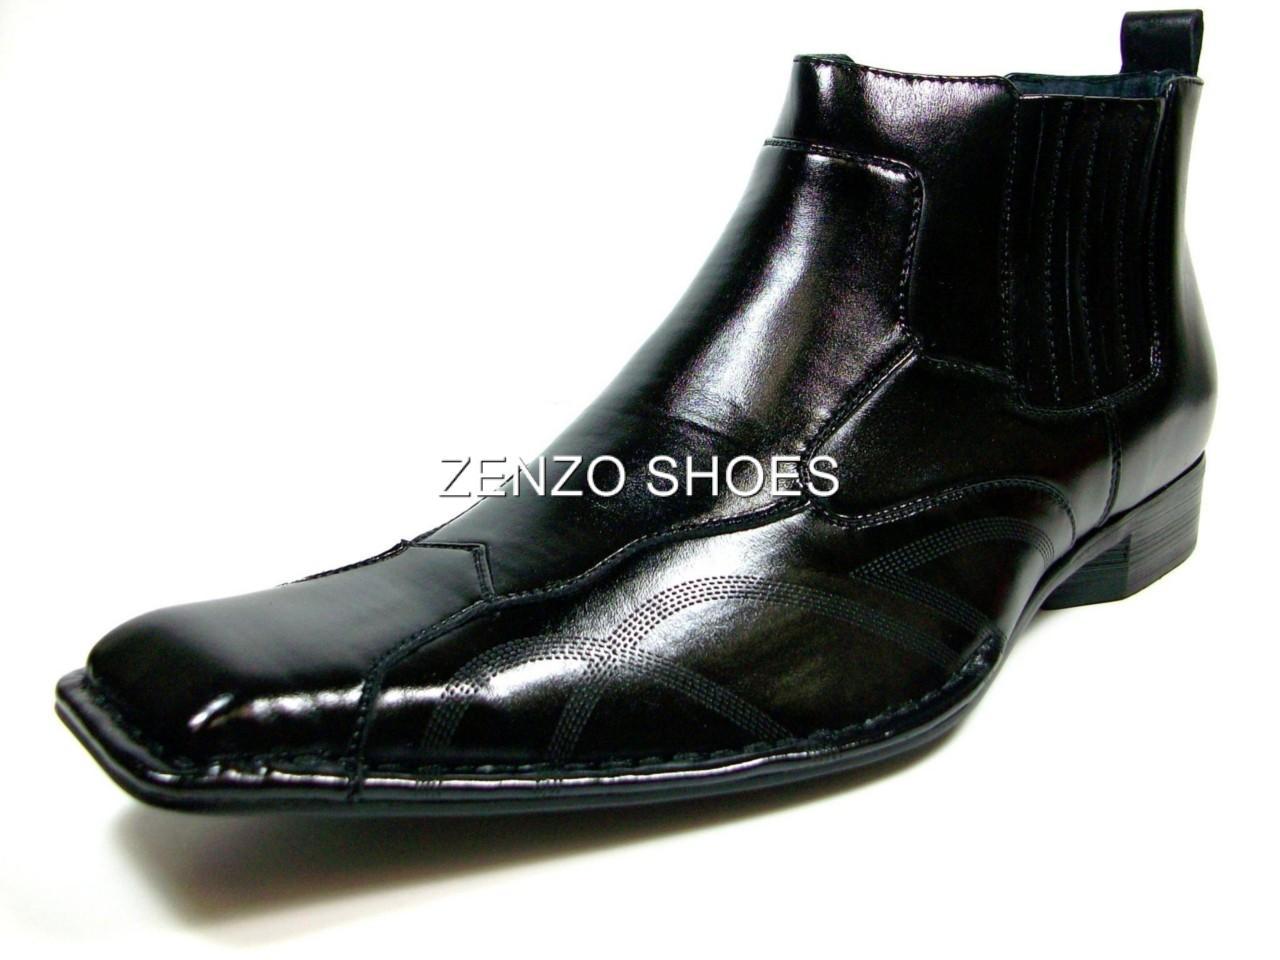 d aldo mens italian style dress casual boots shoes nib ebay